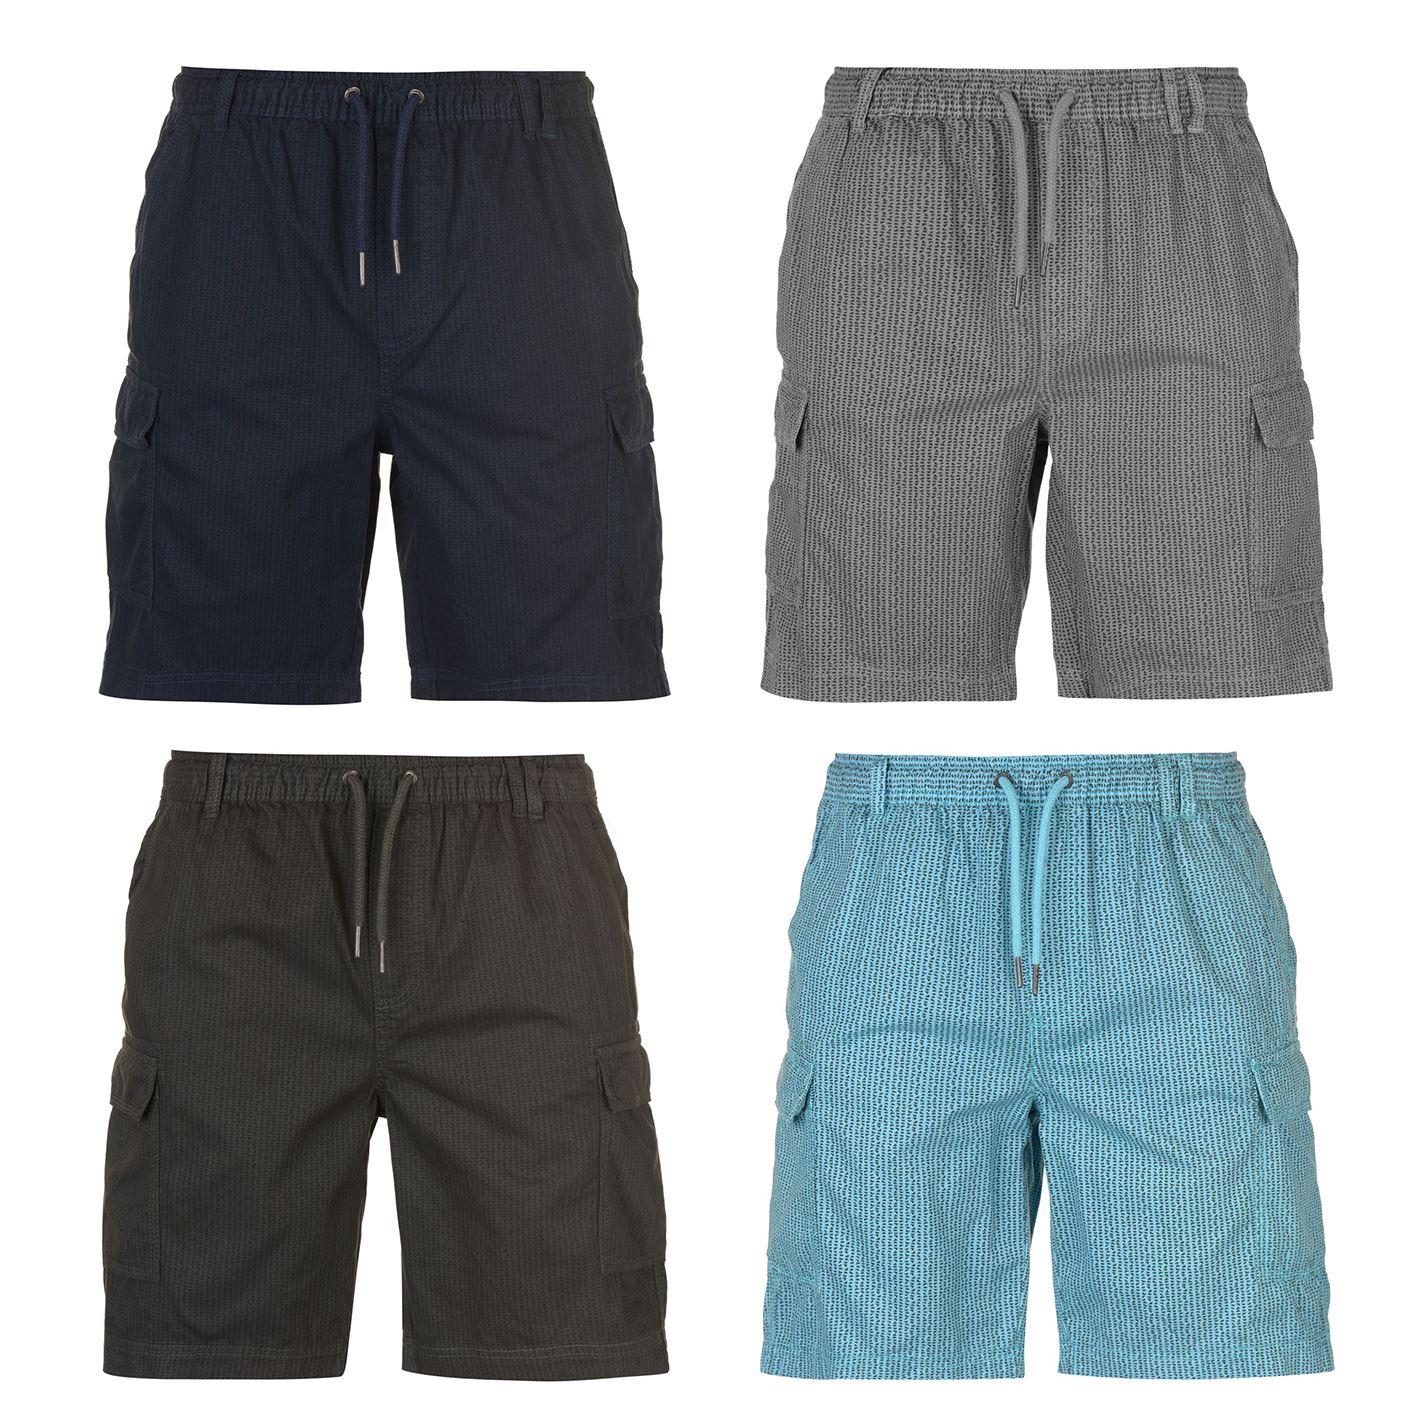 Nero Pantaloncini Estivi 11-12 anni Bambina Skinni